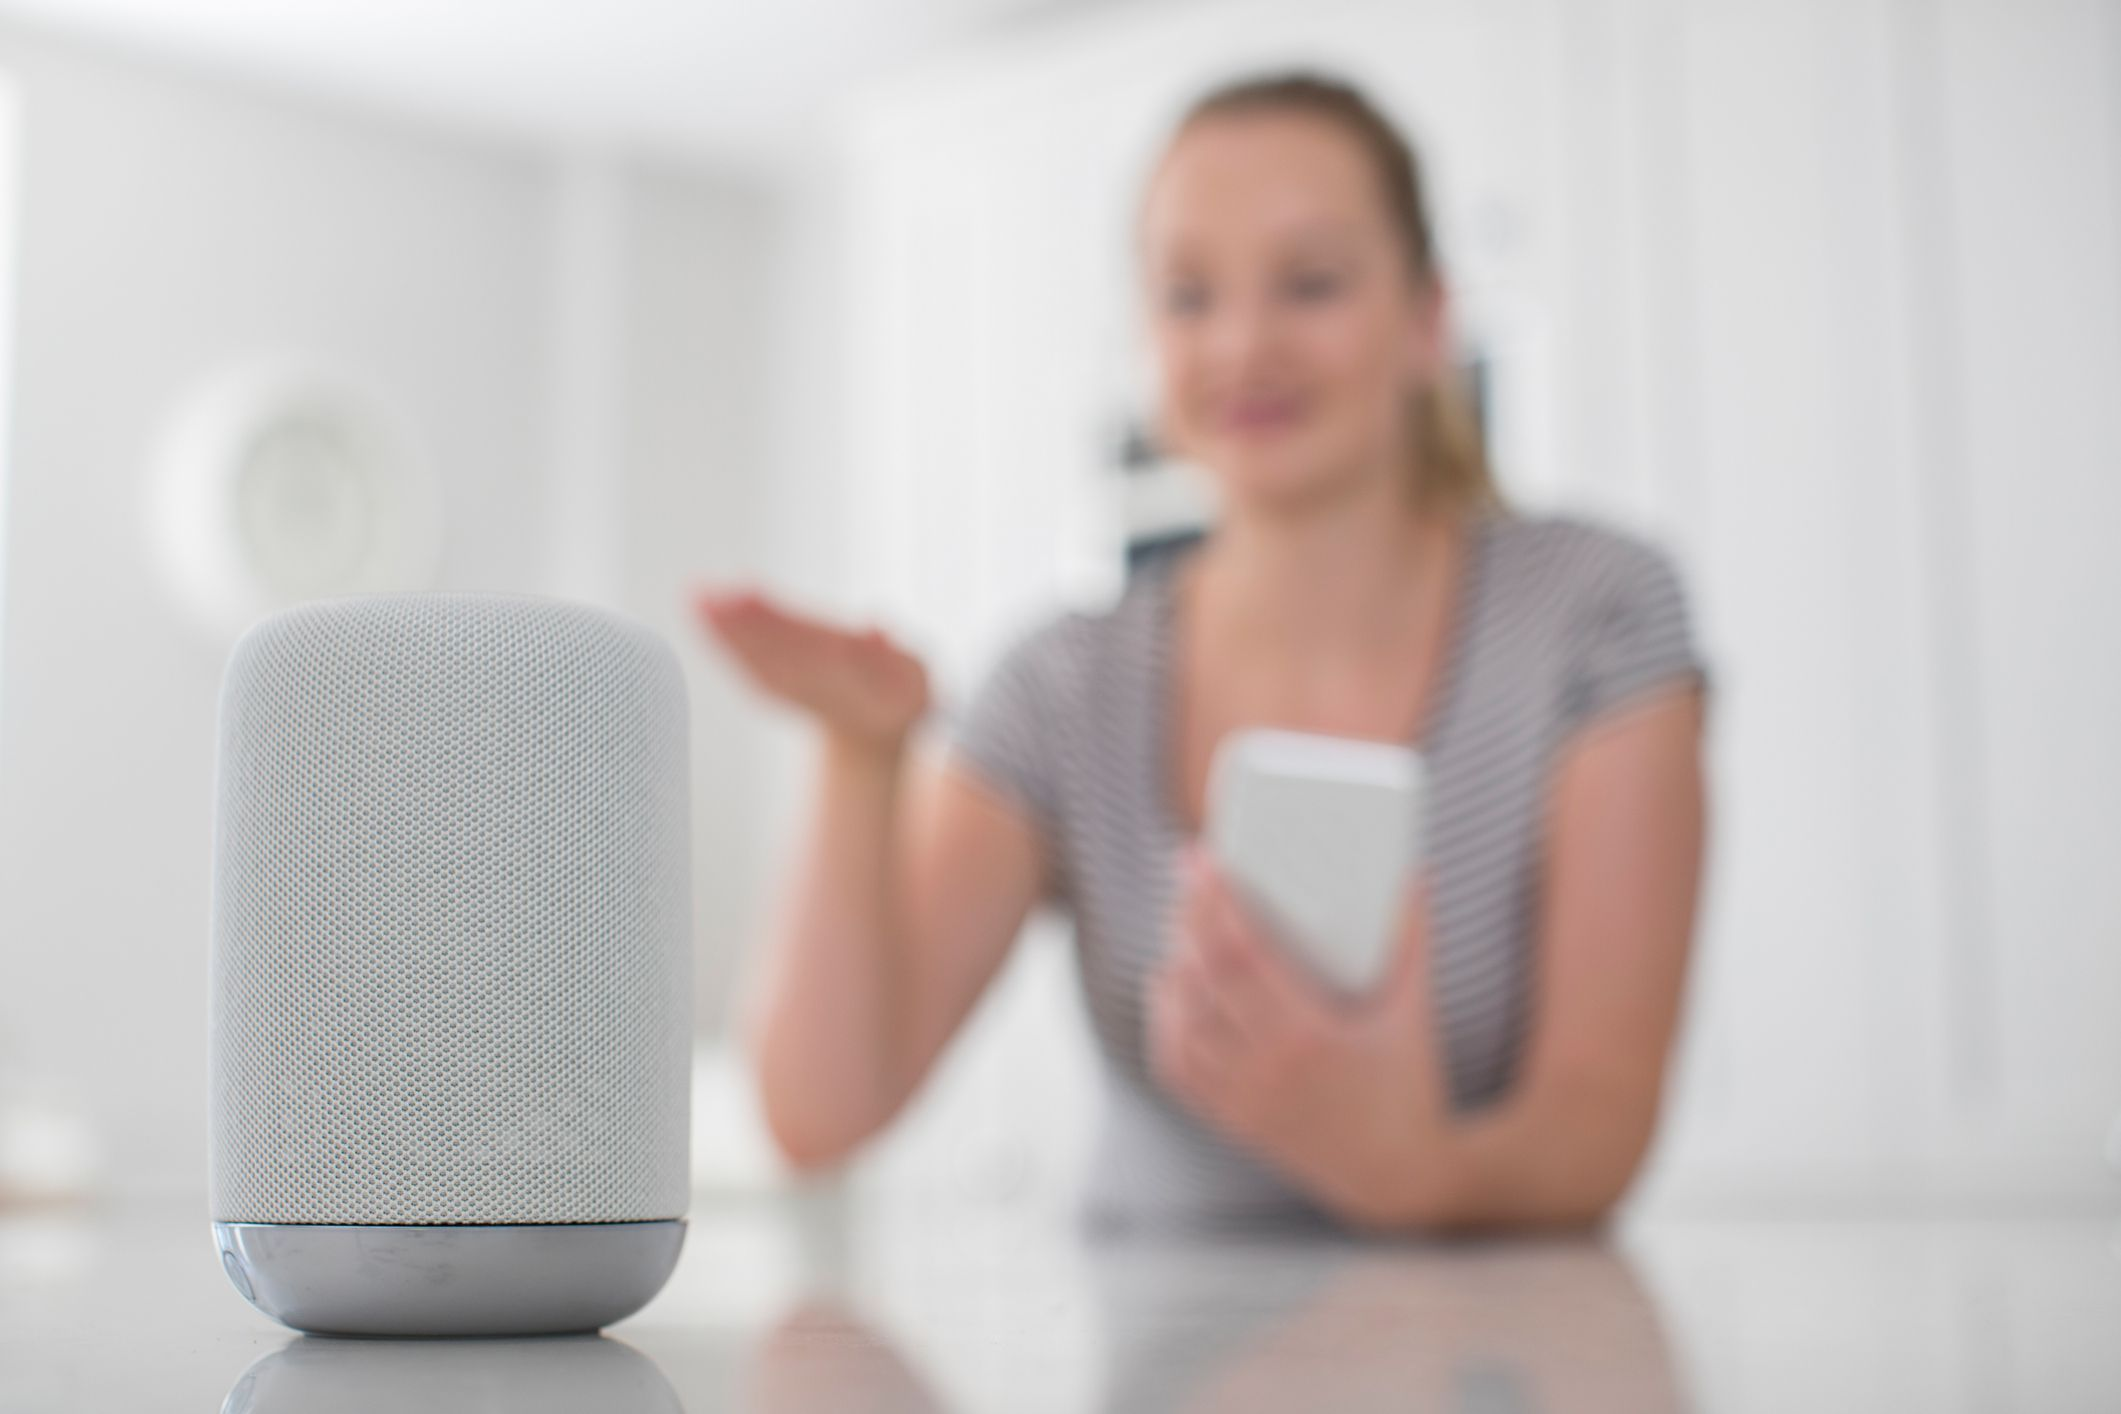 Use Amazon Alexa to Make Calls and Send Messages Amazon